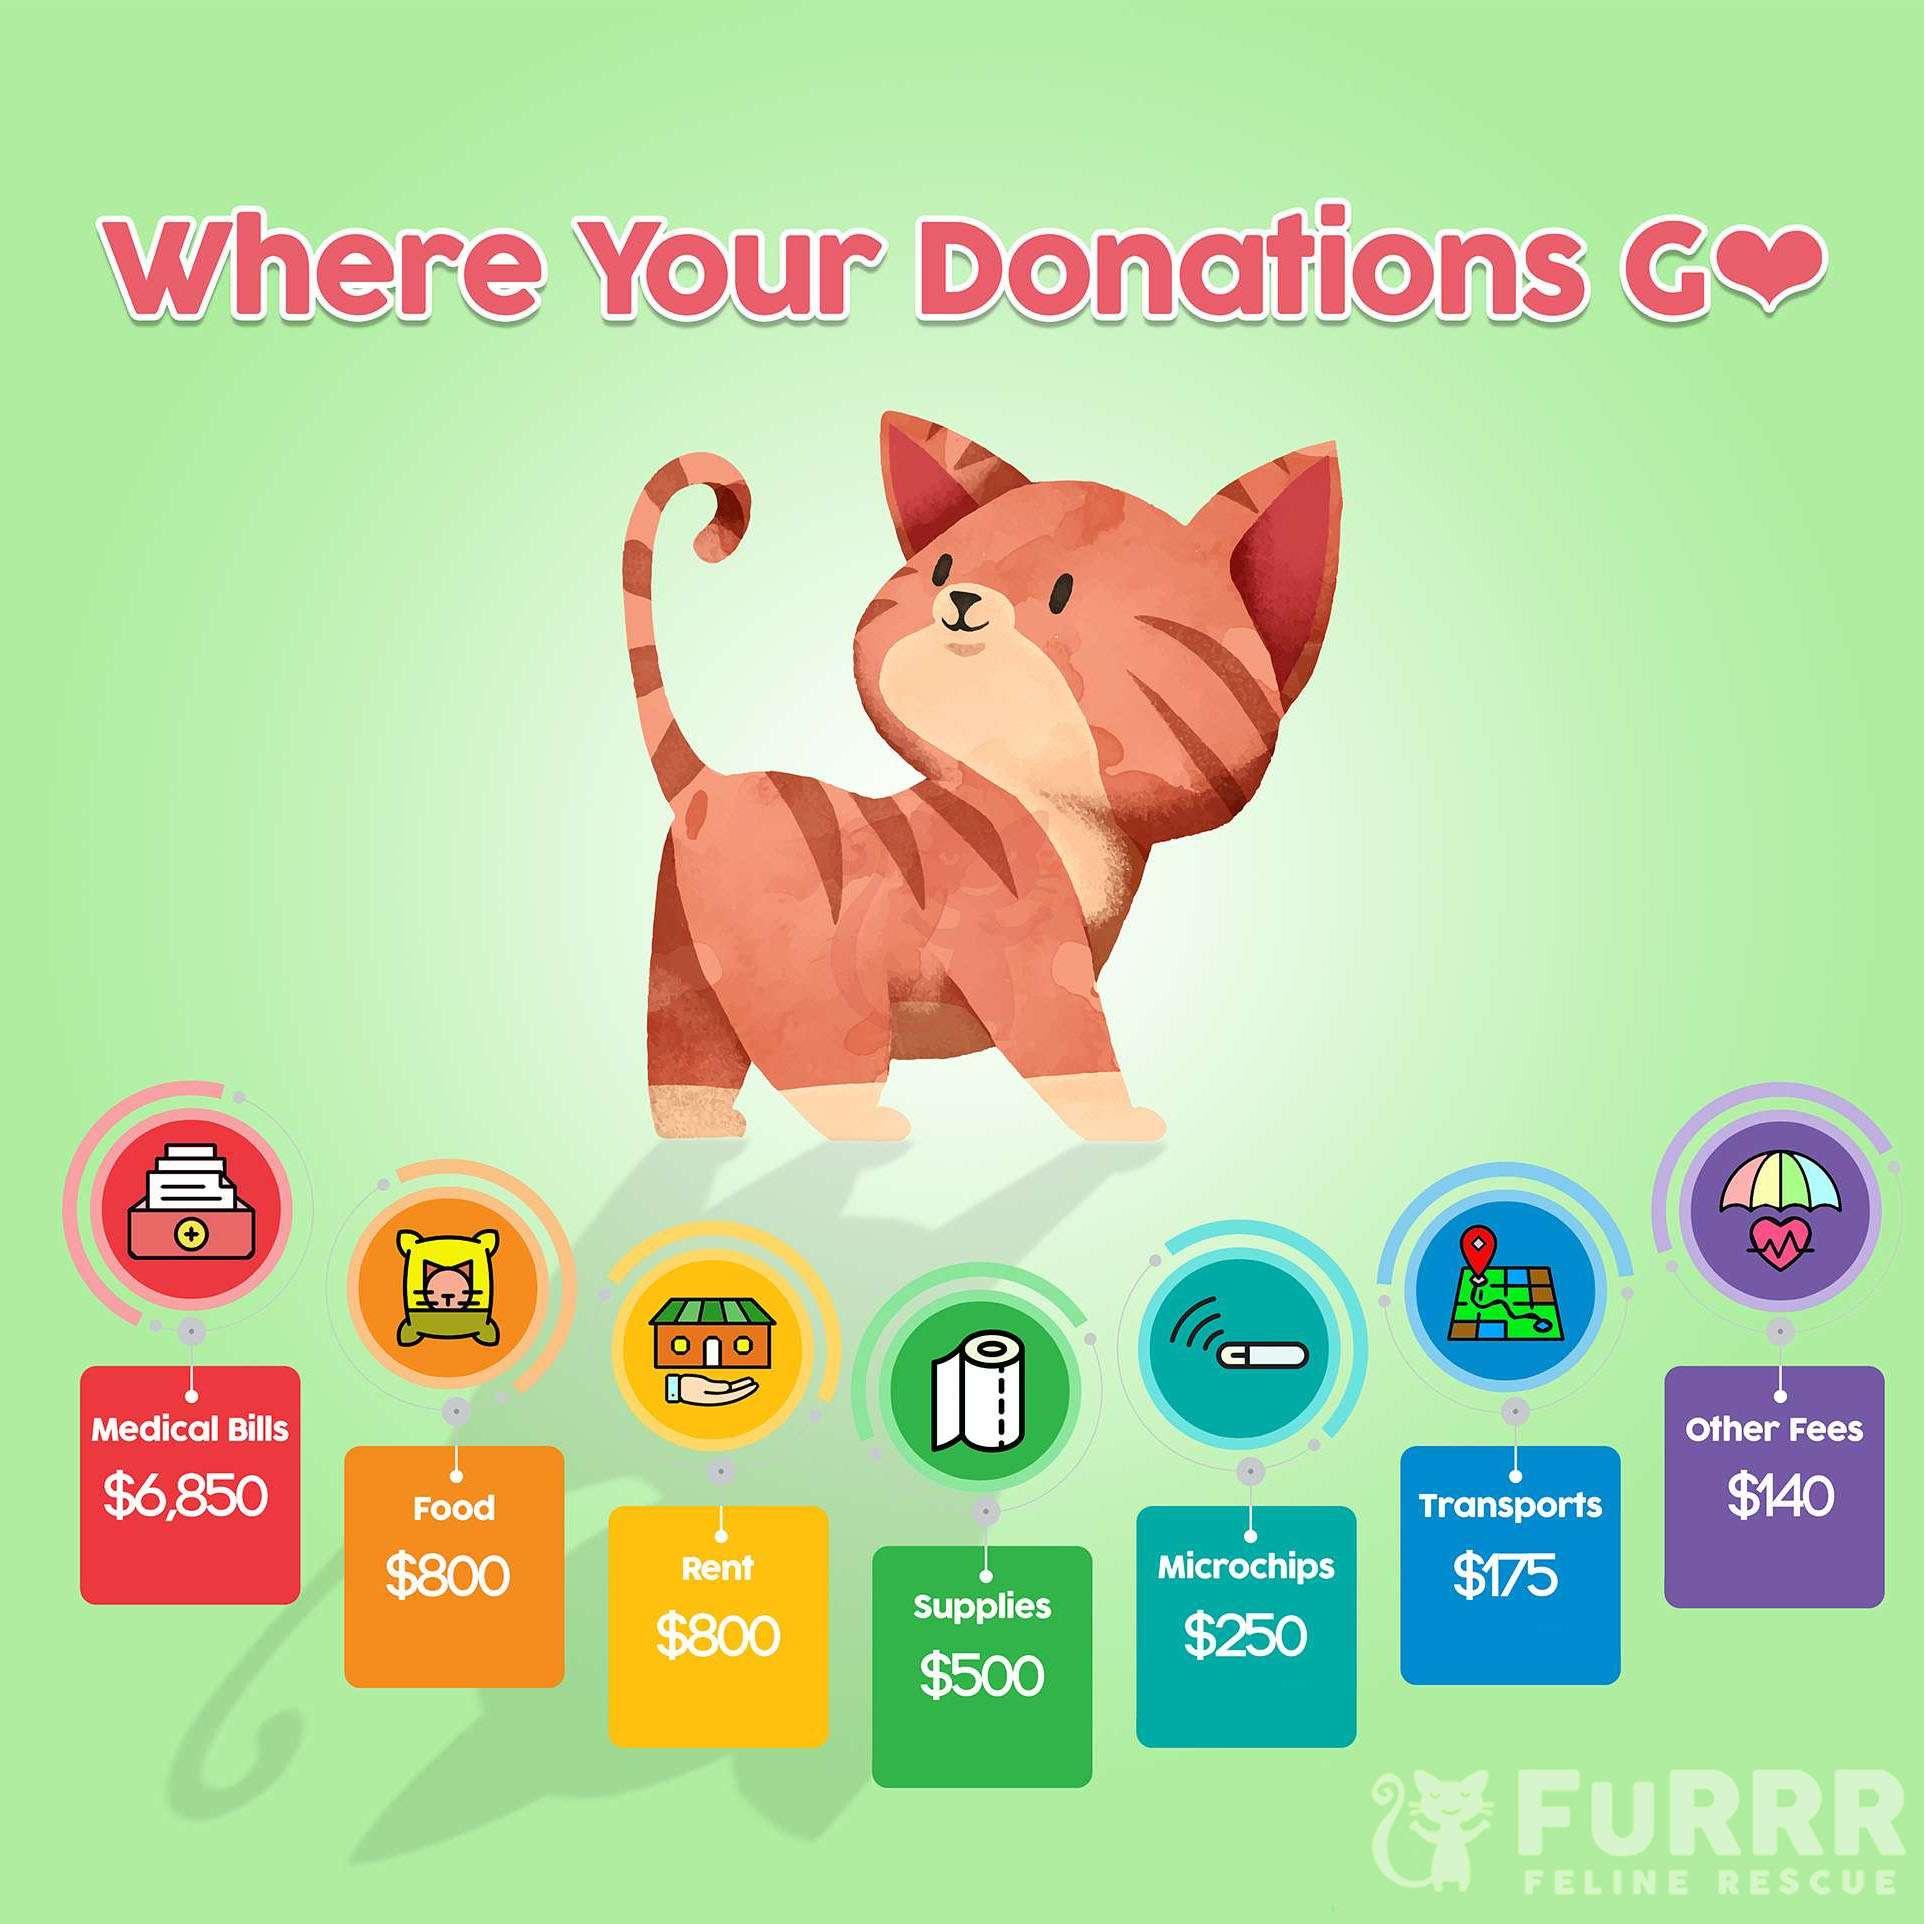 FuRRR-Feline-Cat-Rescue-Donations